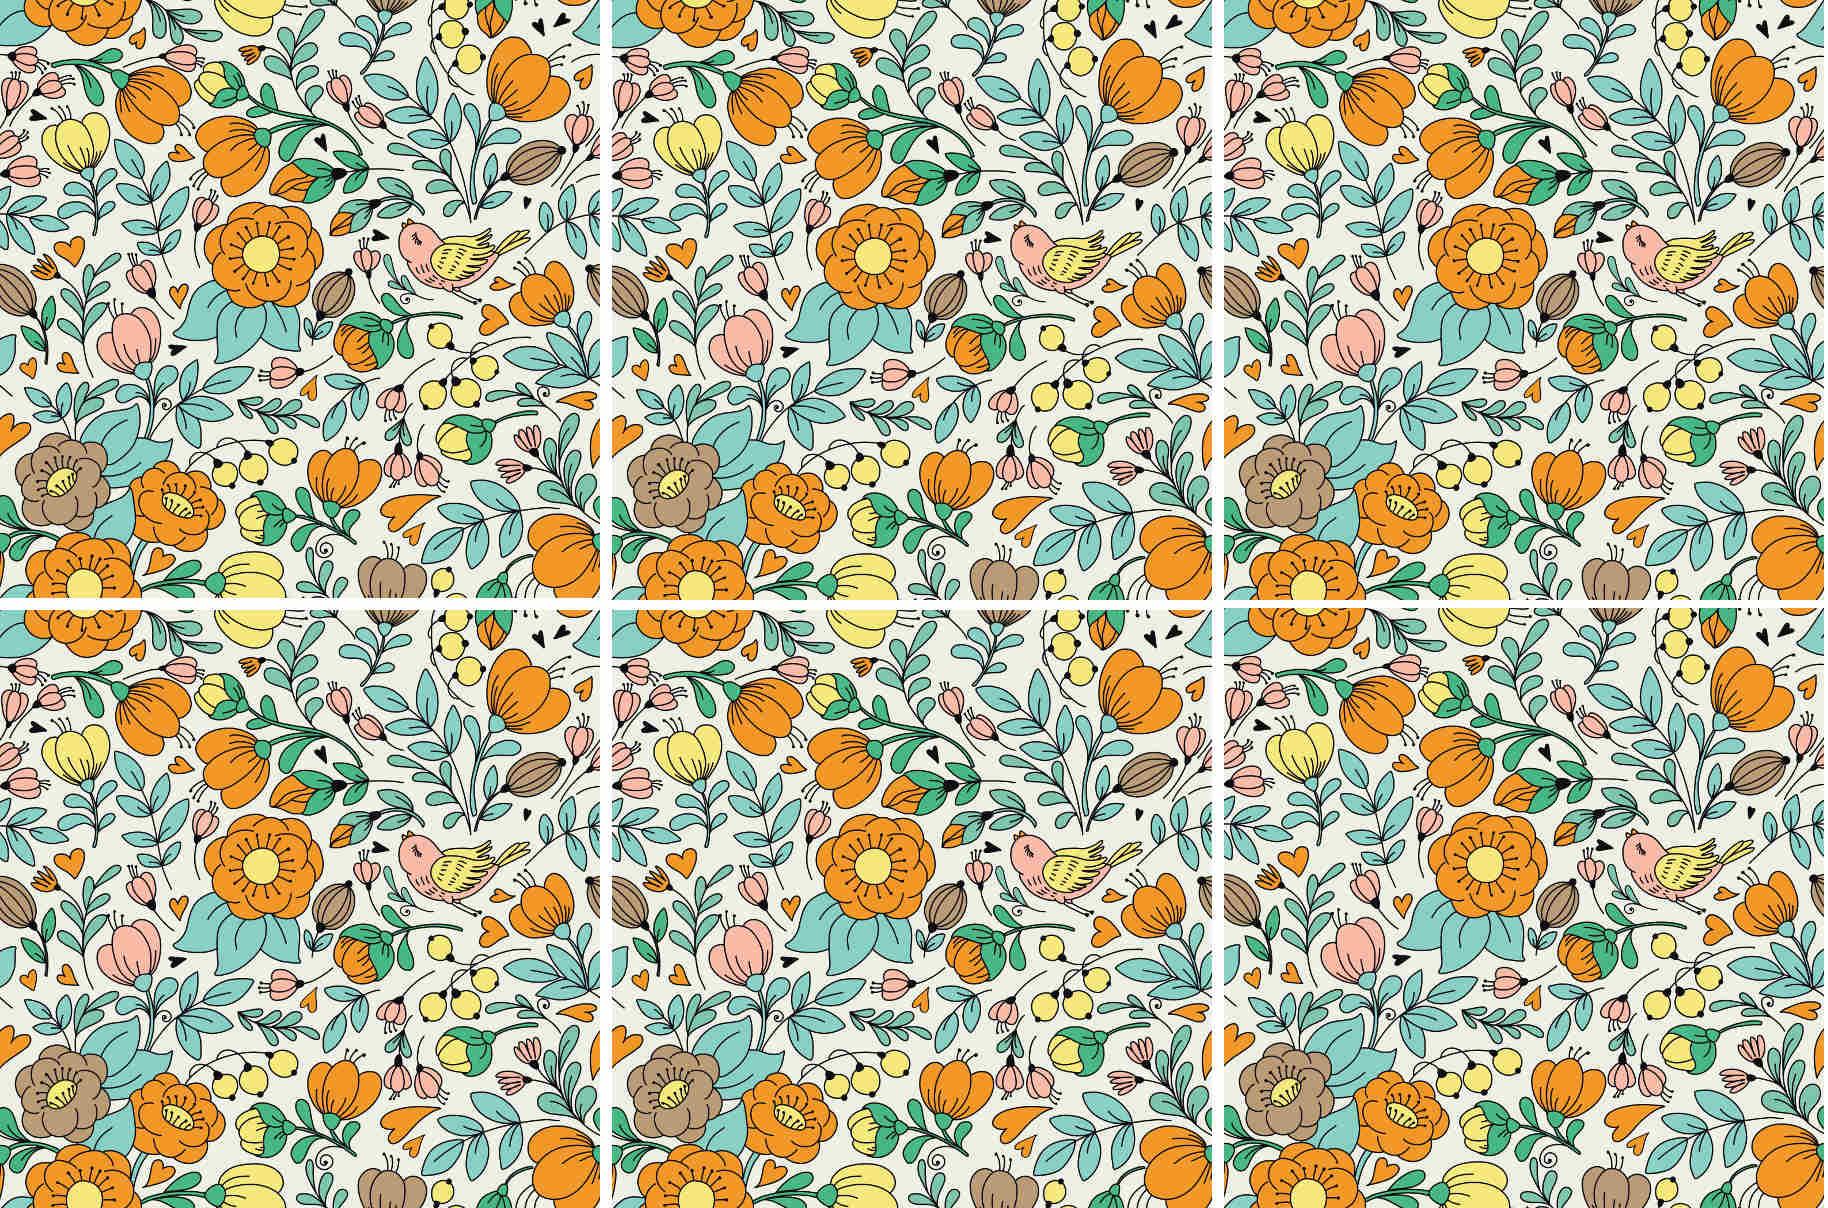 Retro floral pattern square ceramic wall tile